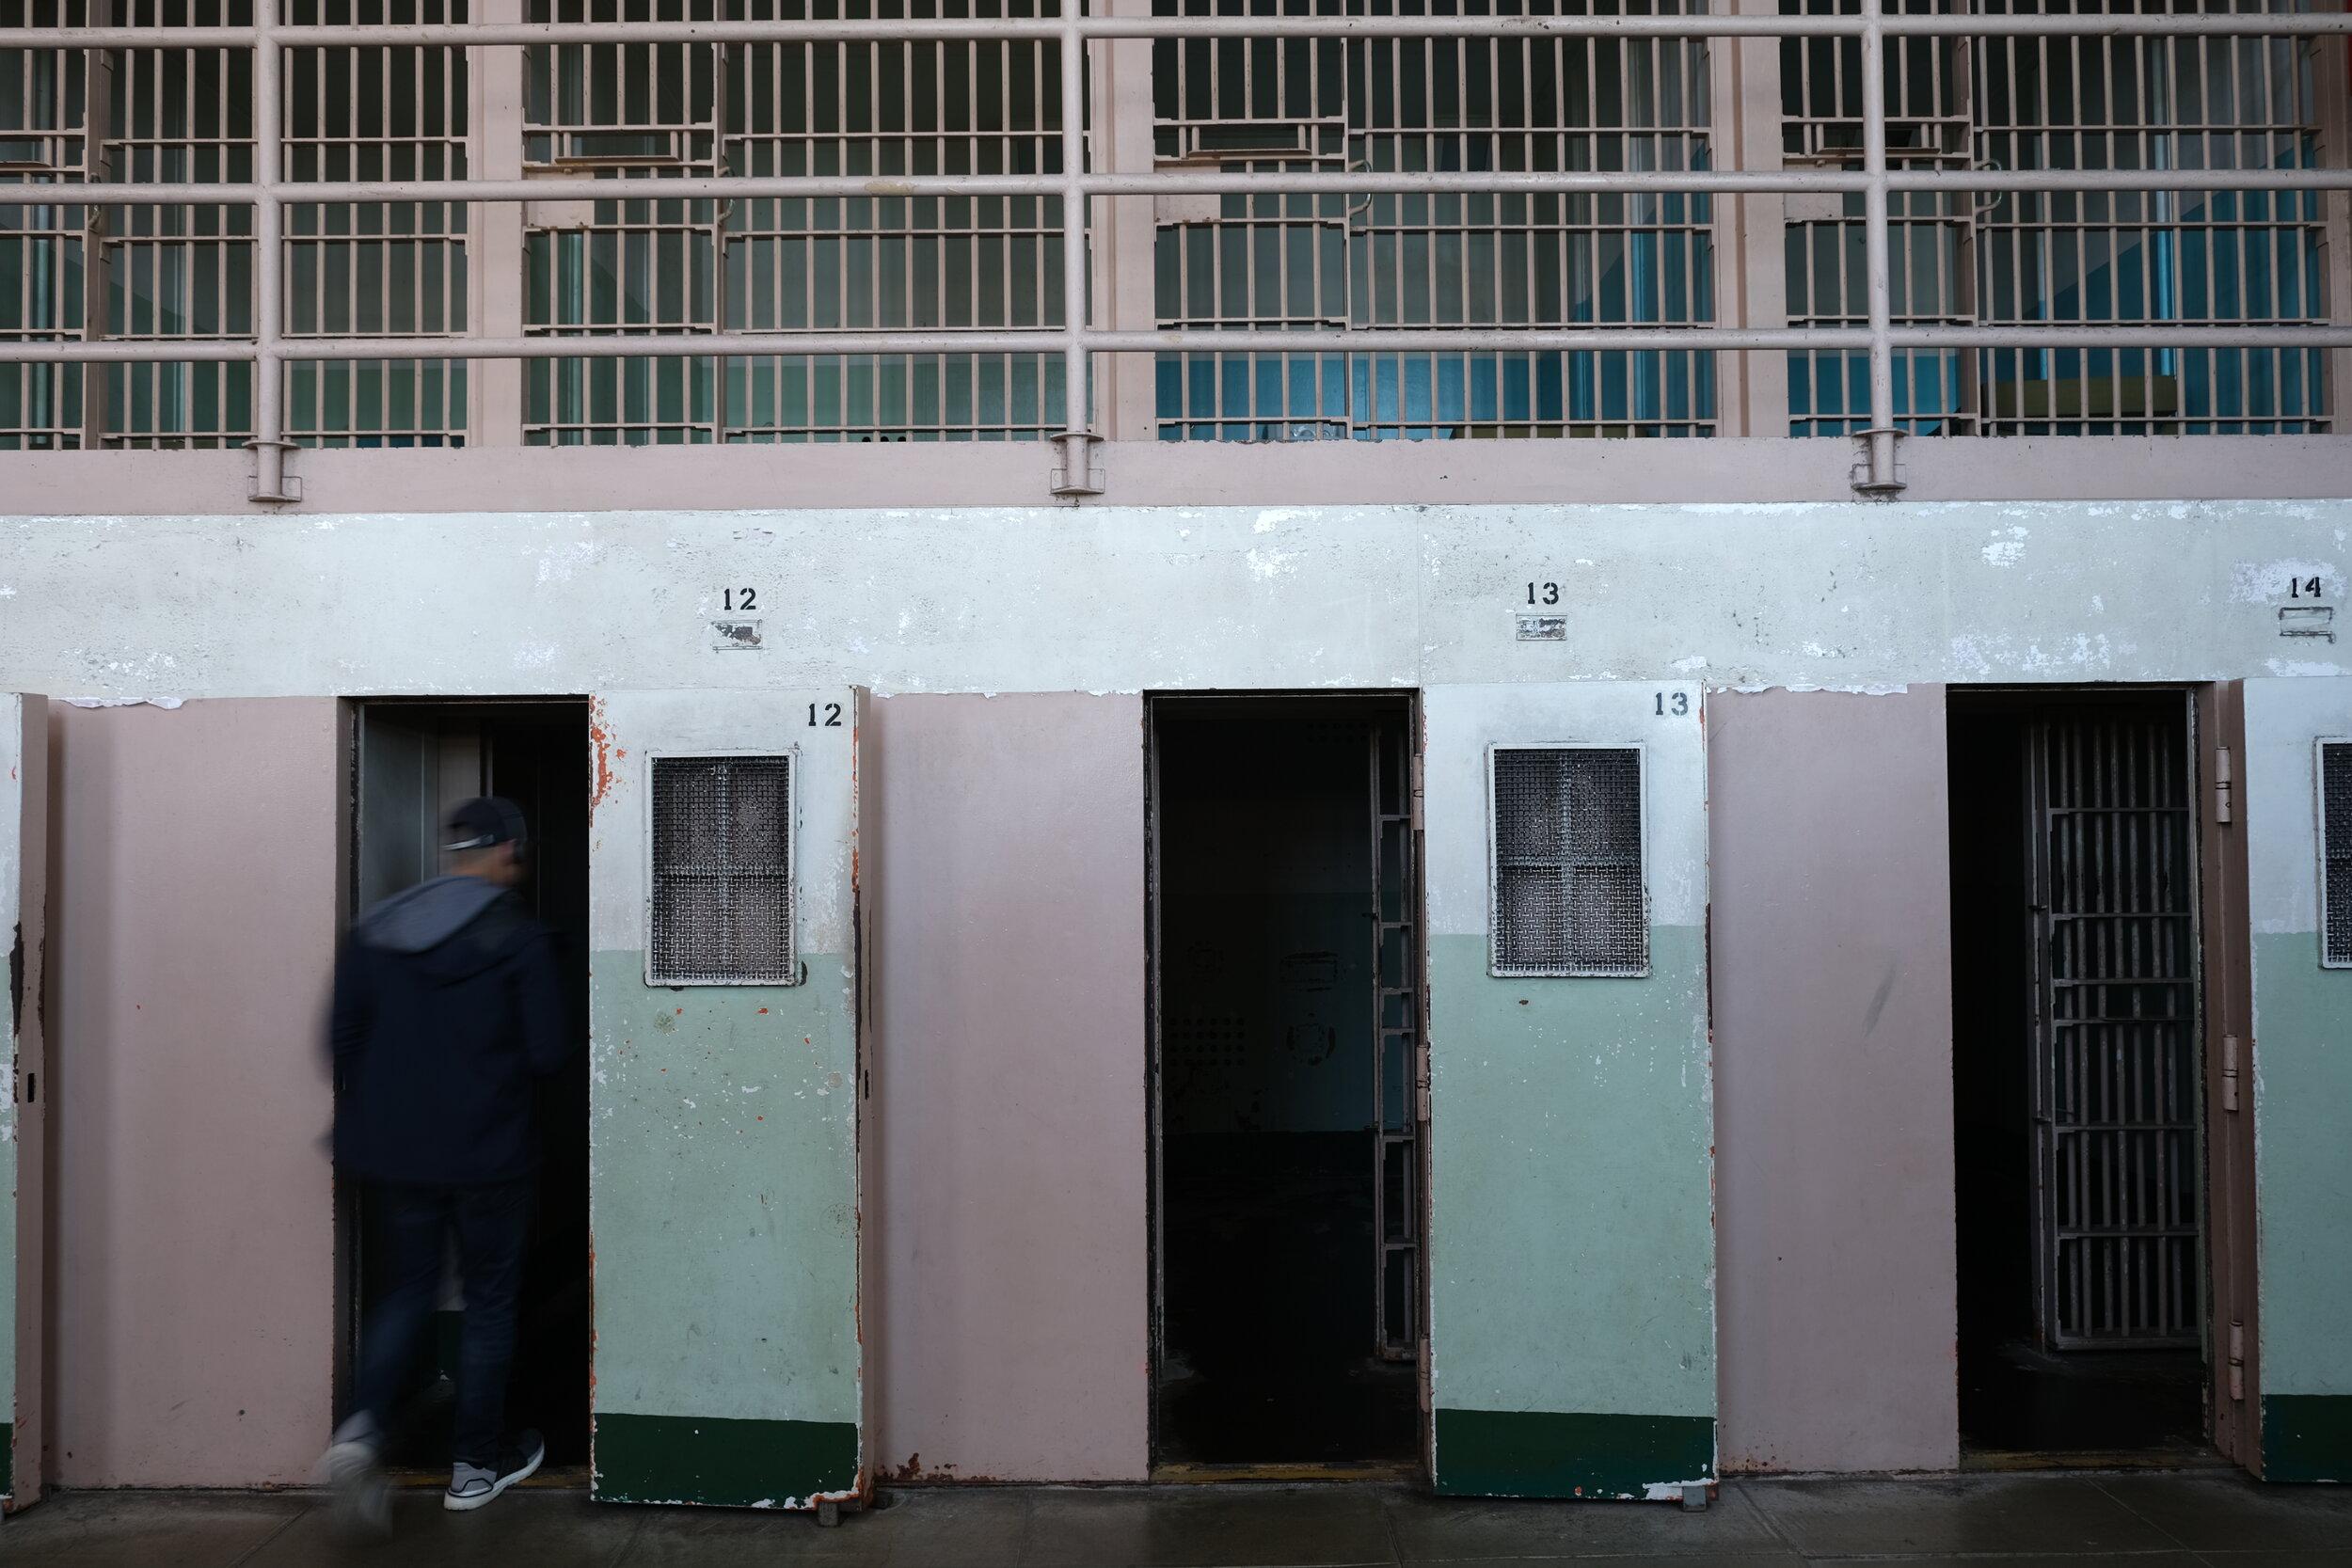 Even felons need tiny dark hell rooms